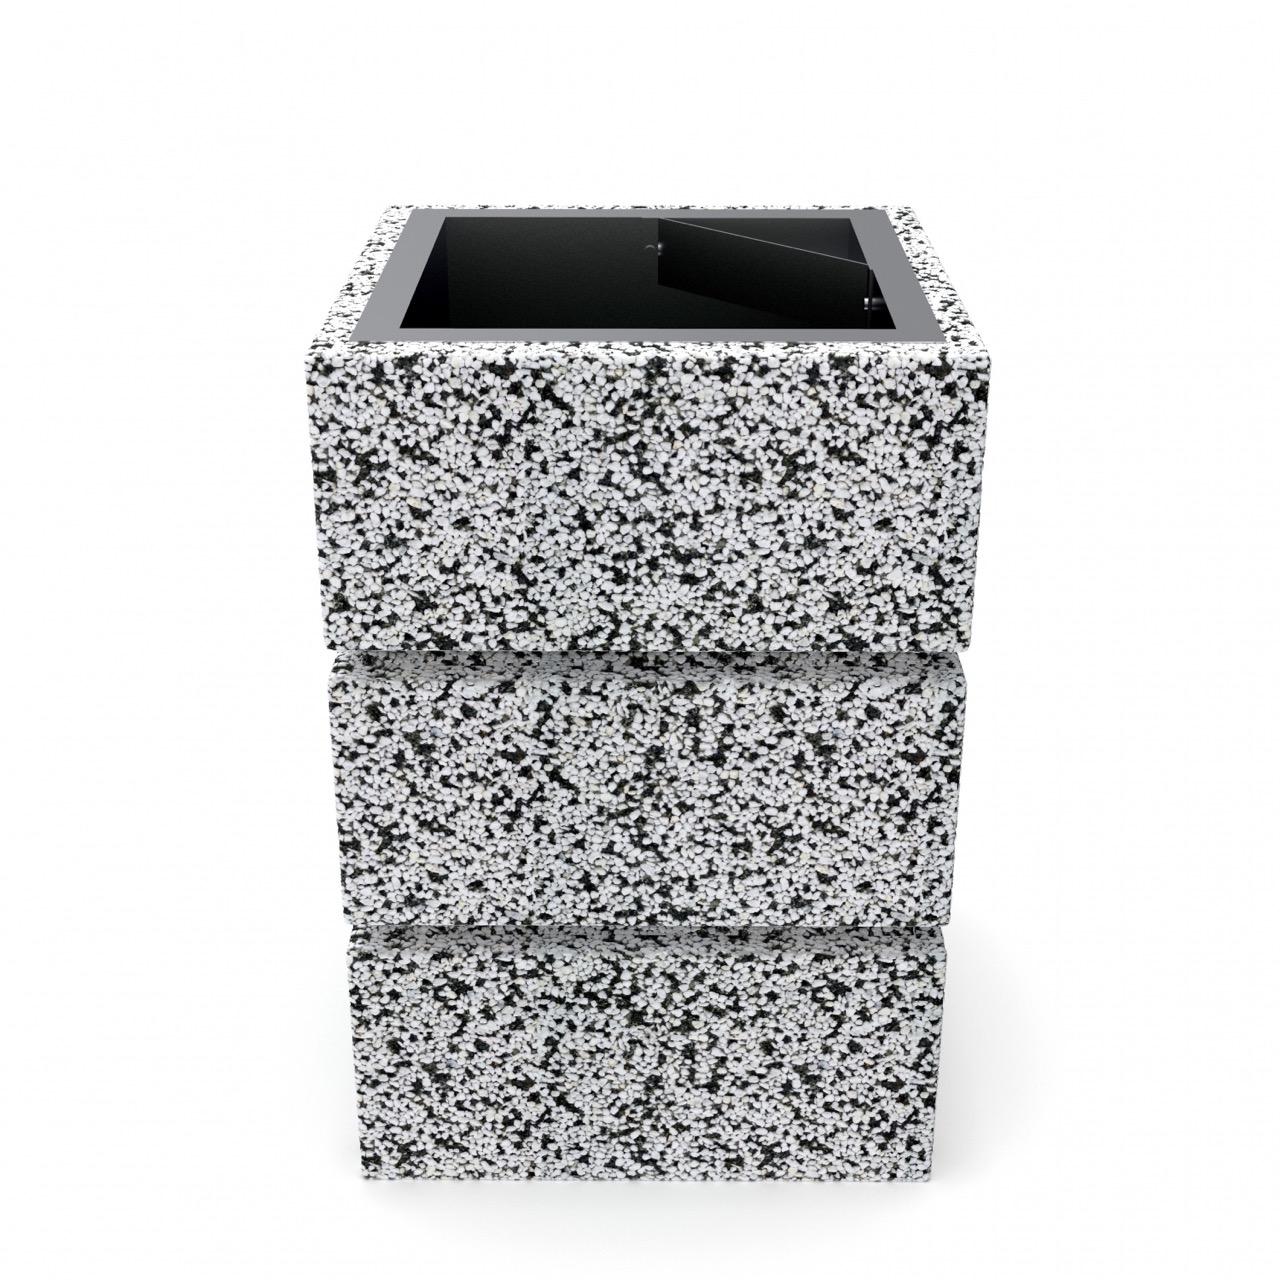 Троя бетон купить бетон для фундамента с доставкой цена в брянске